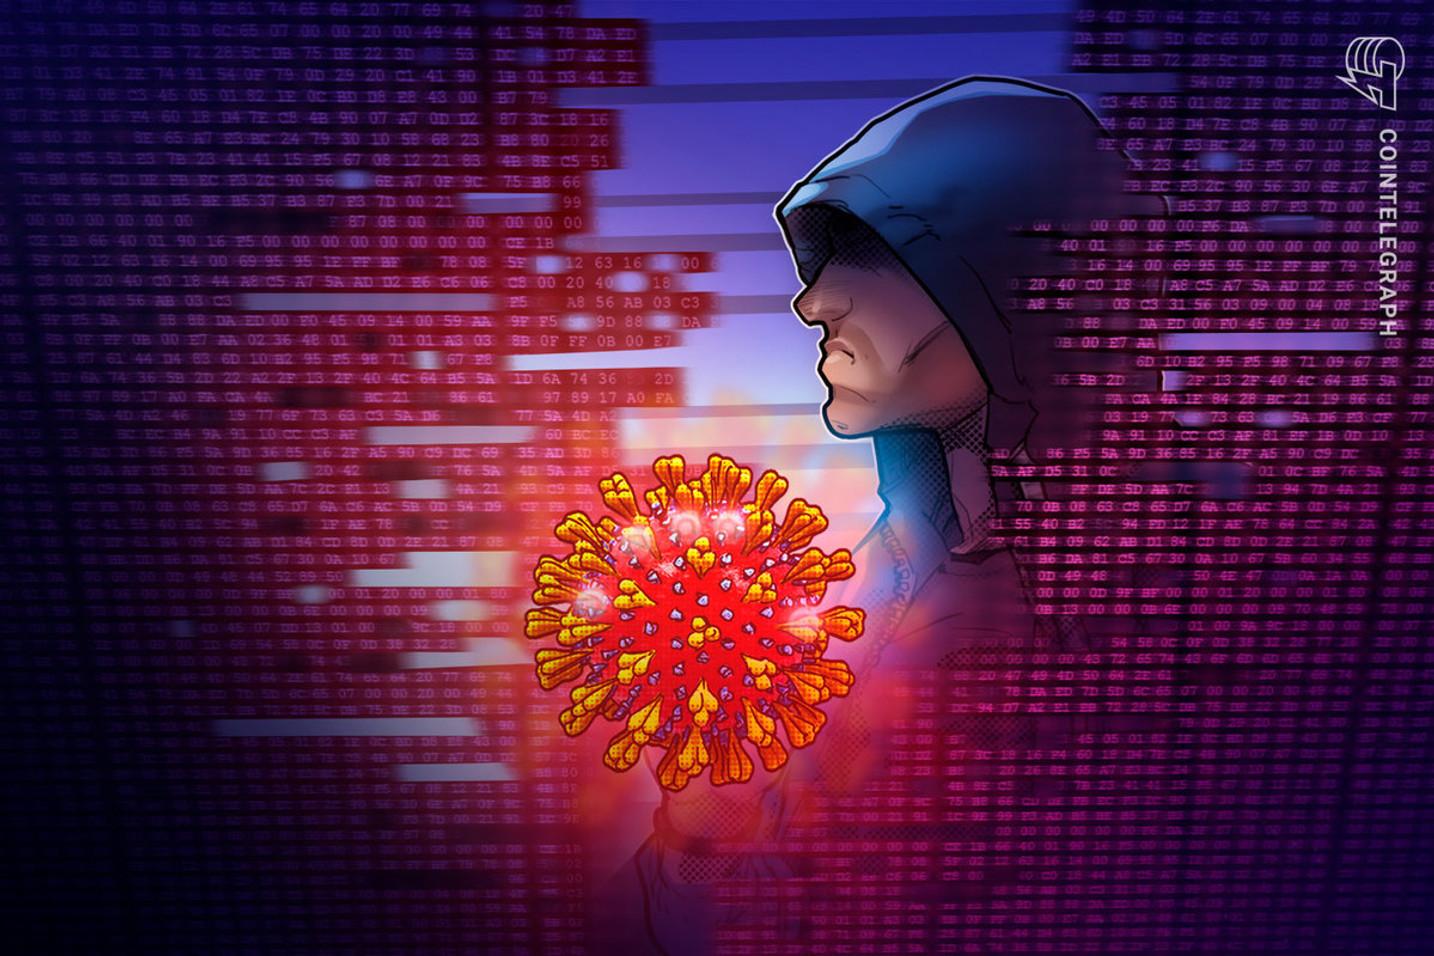 CovidLock aprovecha el temor sobre el Coronavirus para instalar ransomware de Bitcoin